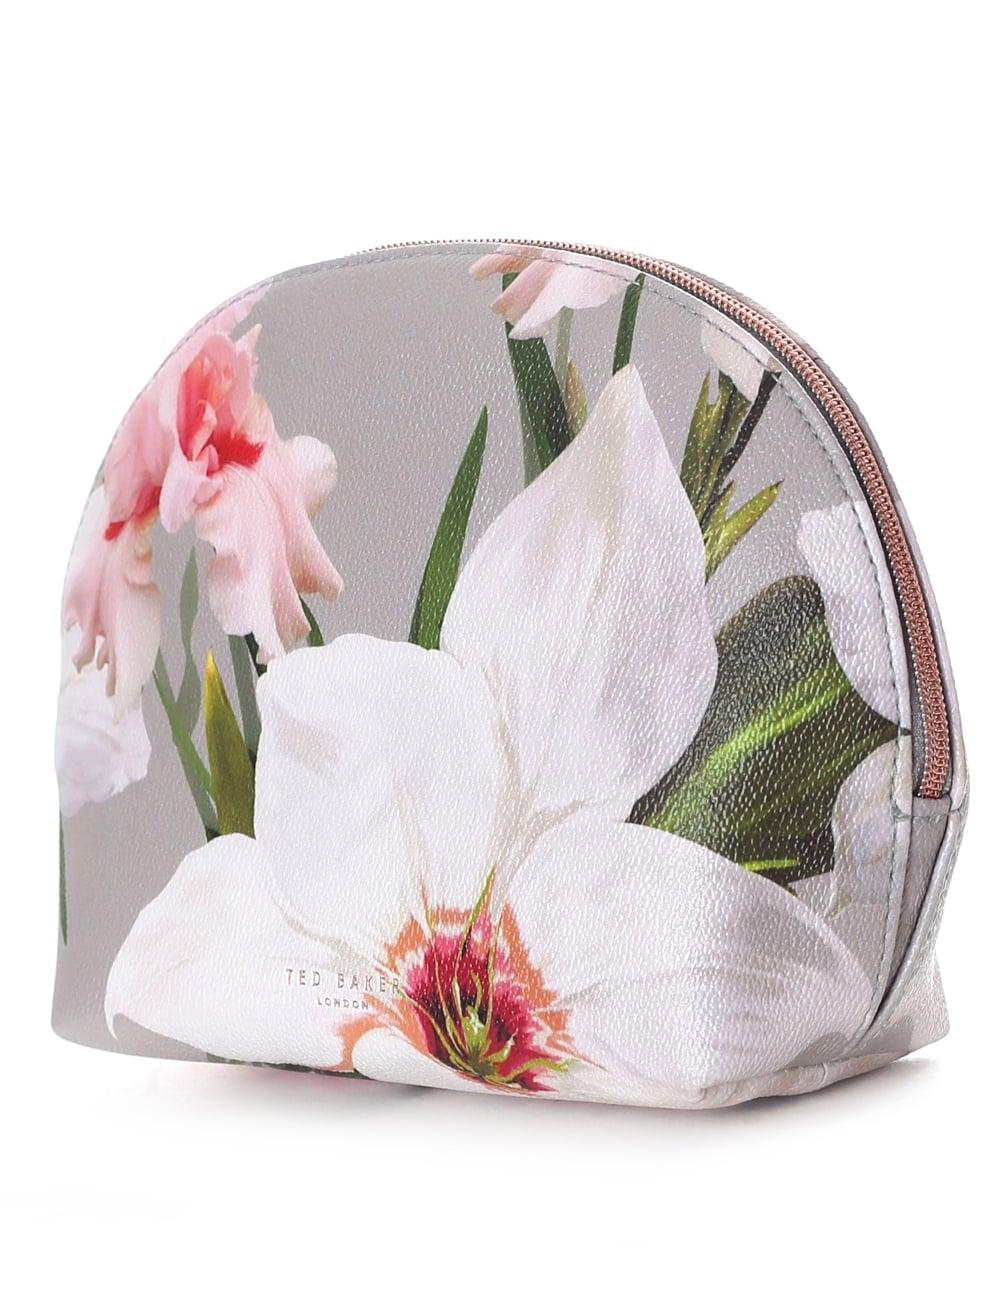 19b19a87a Ted Baker Marcene Women s Chatsworth Bloom Dome Wash Bag